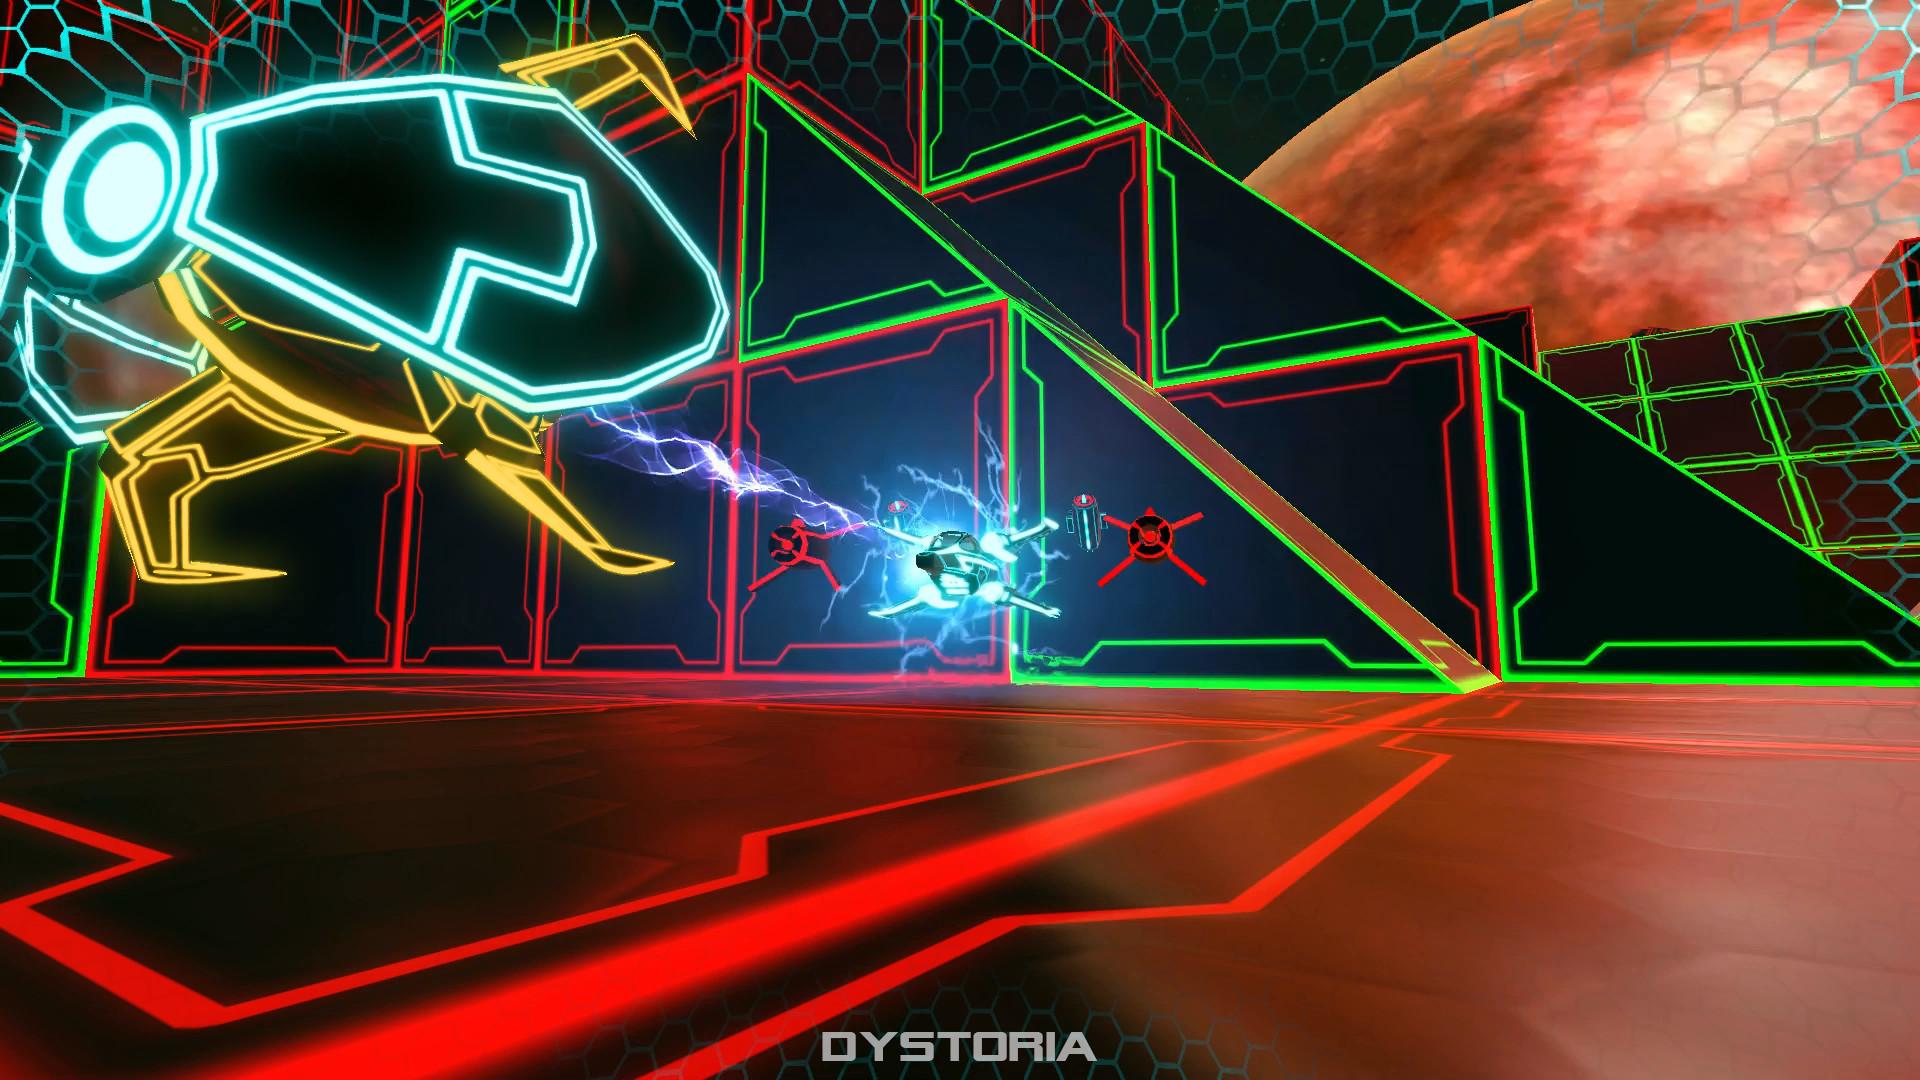 DYSTORIA Screenshot 7